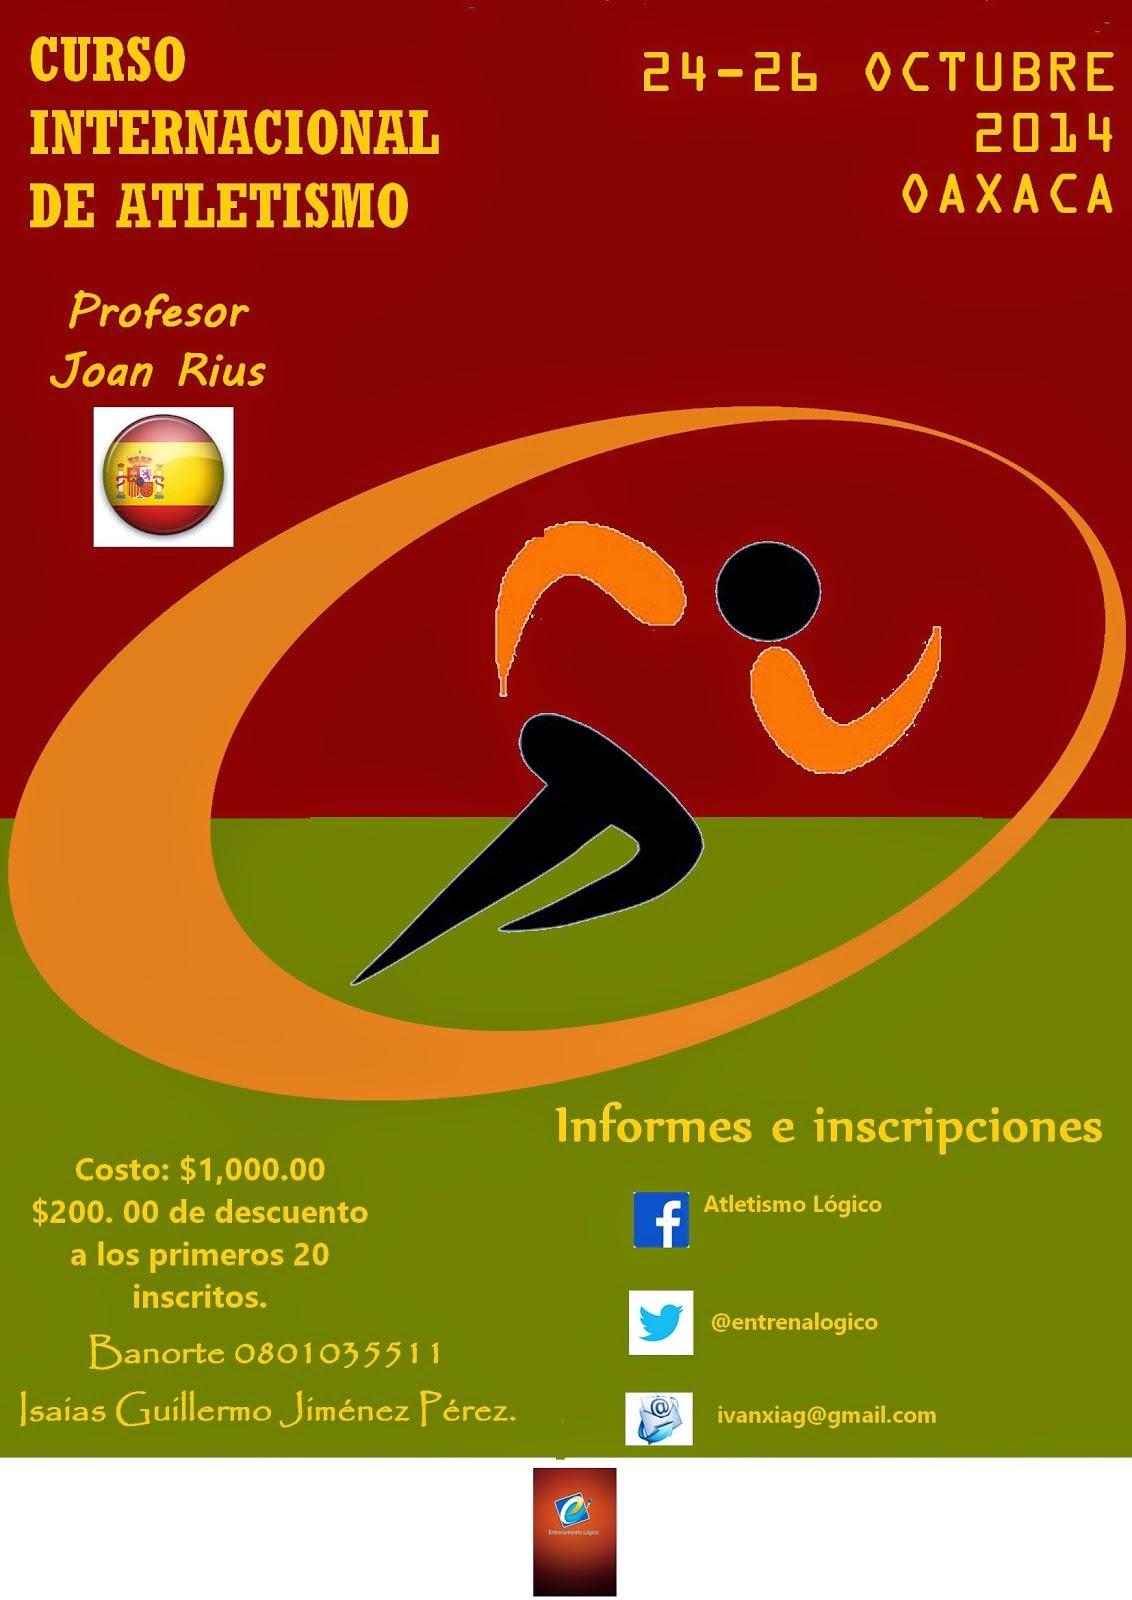 Curso Internacional de Atletismo.